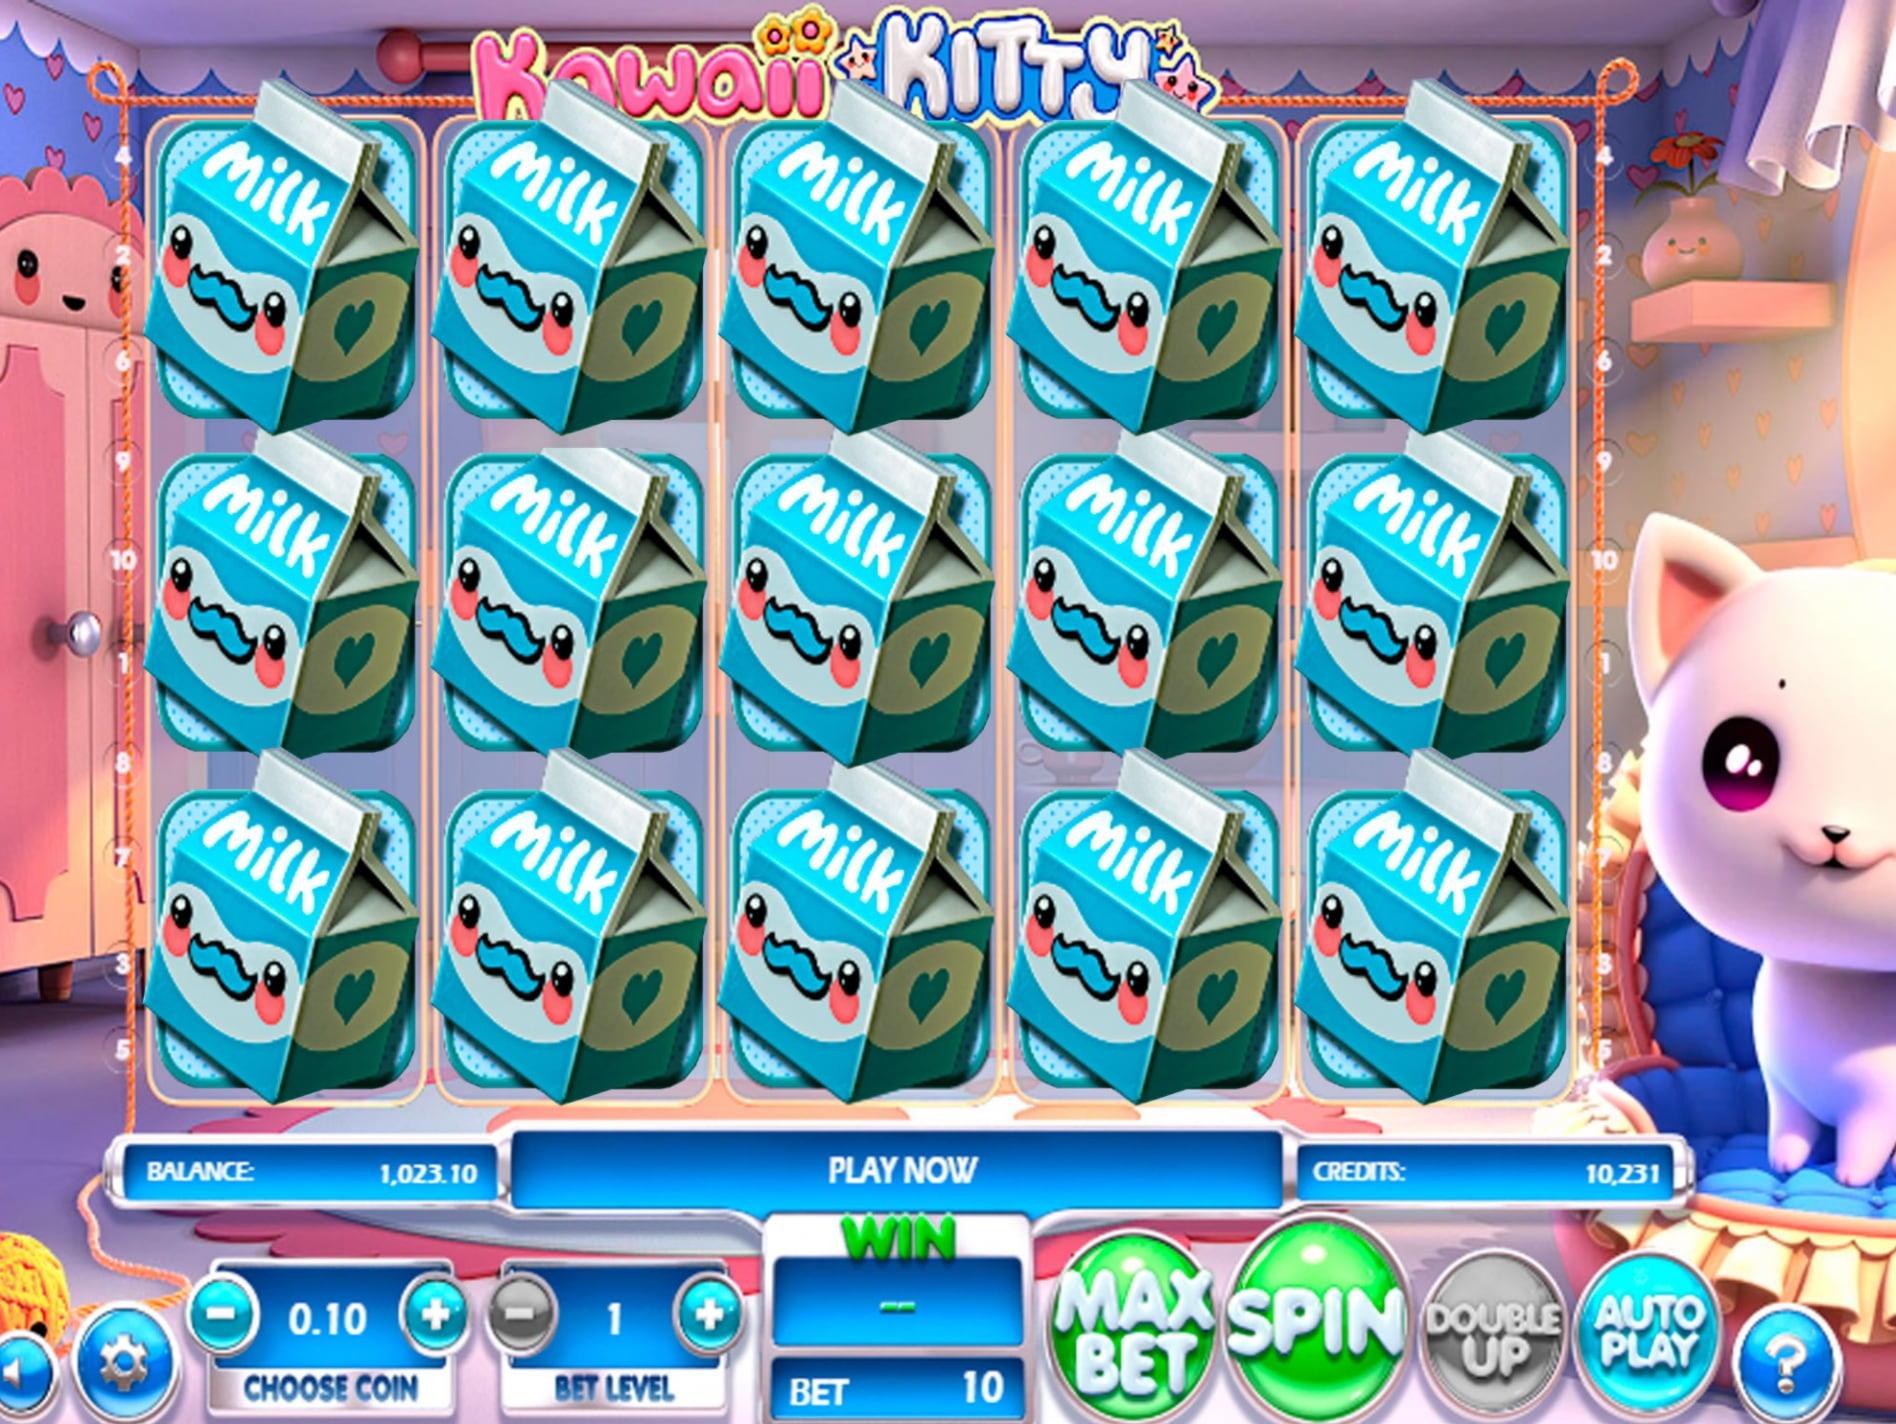 Eur 610 Online Casino Tournament at Match Book